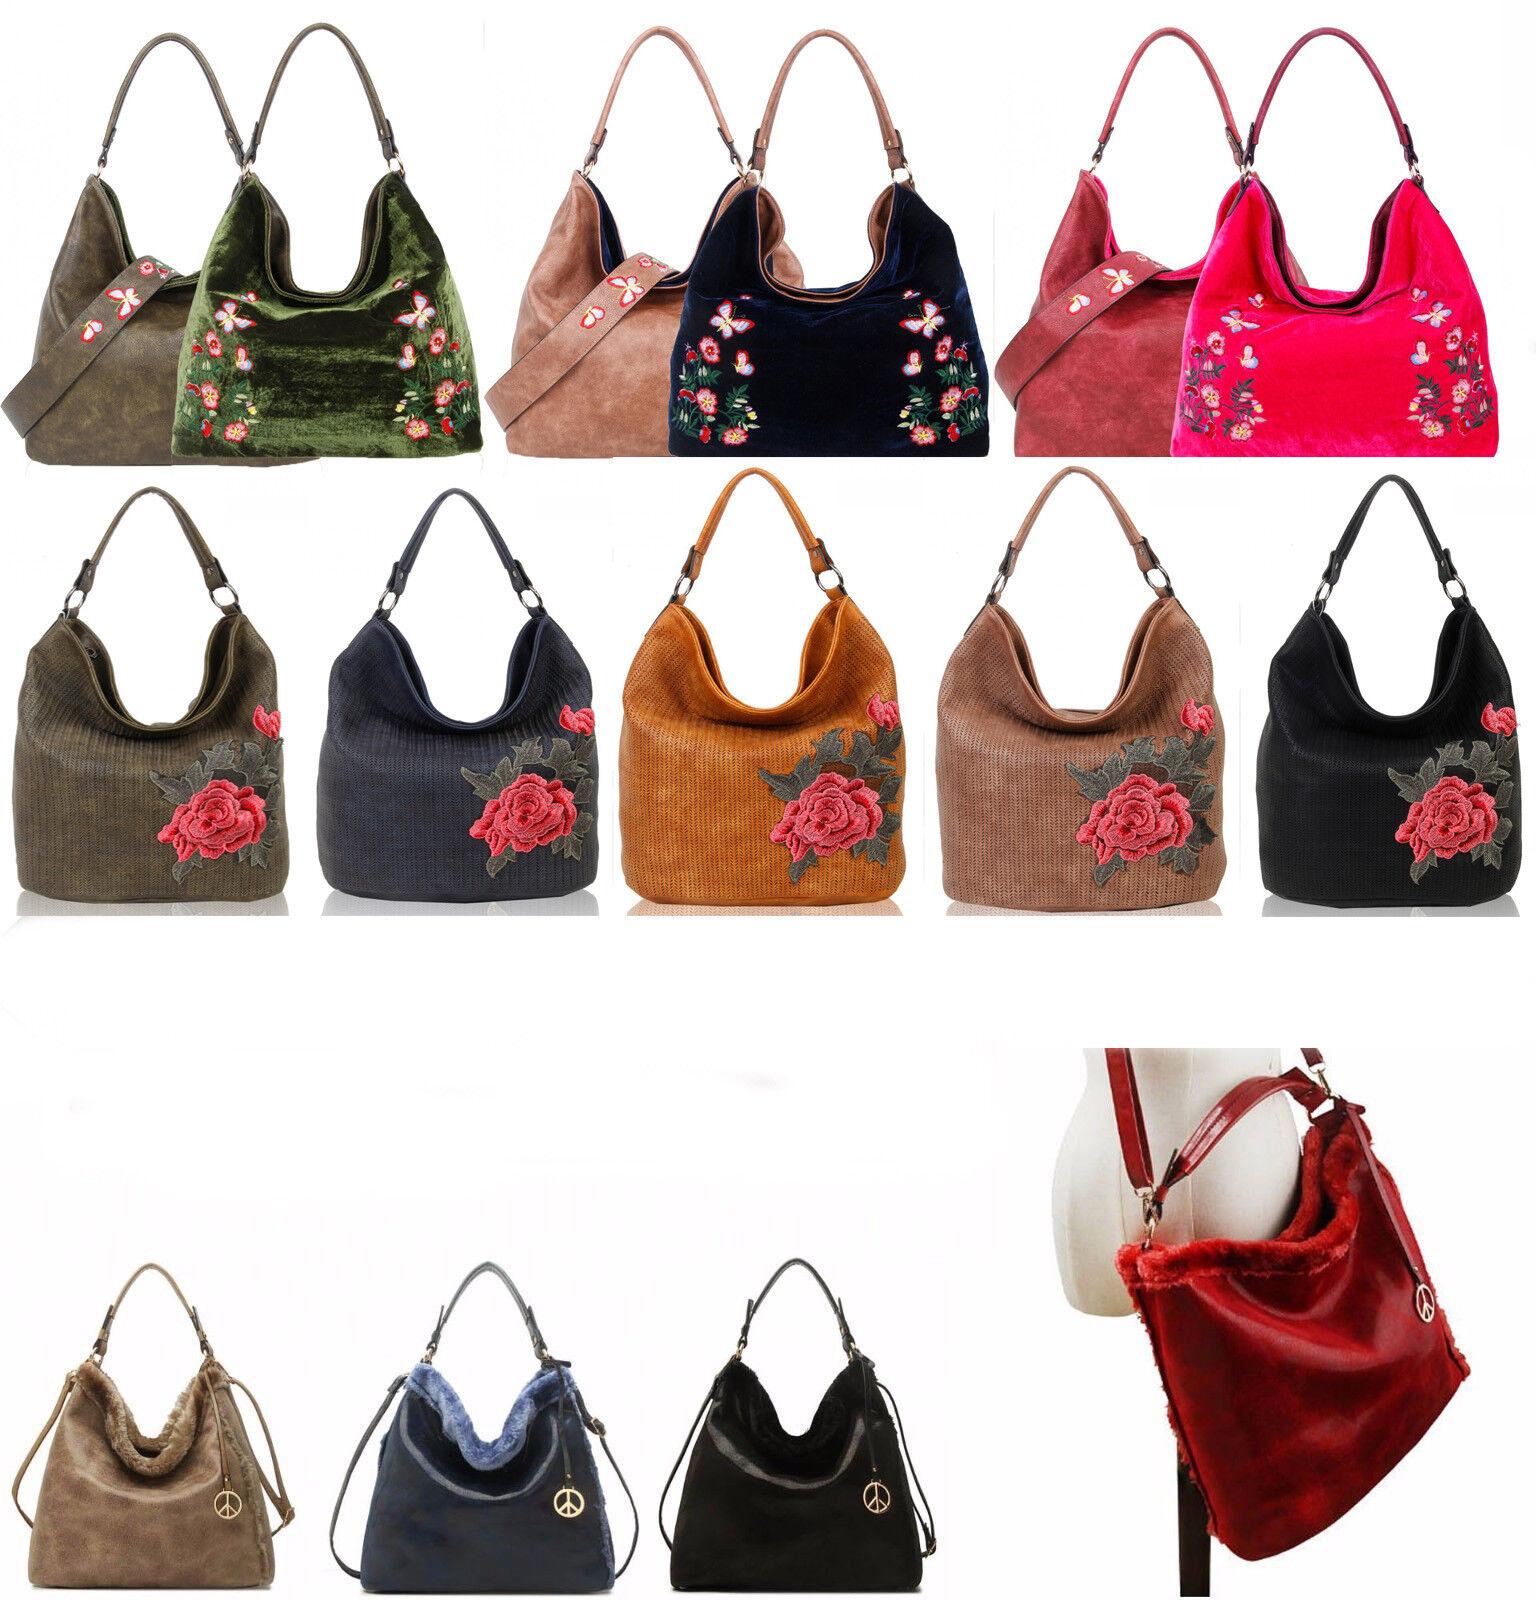 LeahWard Women's Faux Leather Large Shoulder Bag Handbags Fo